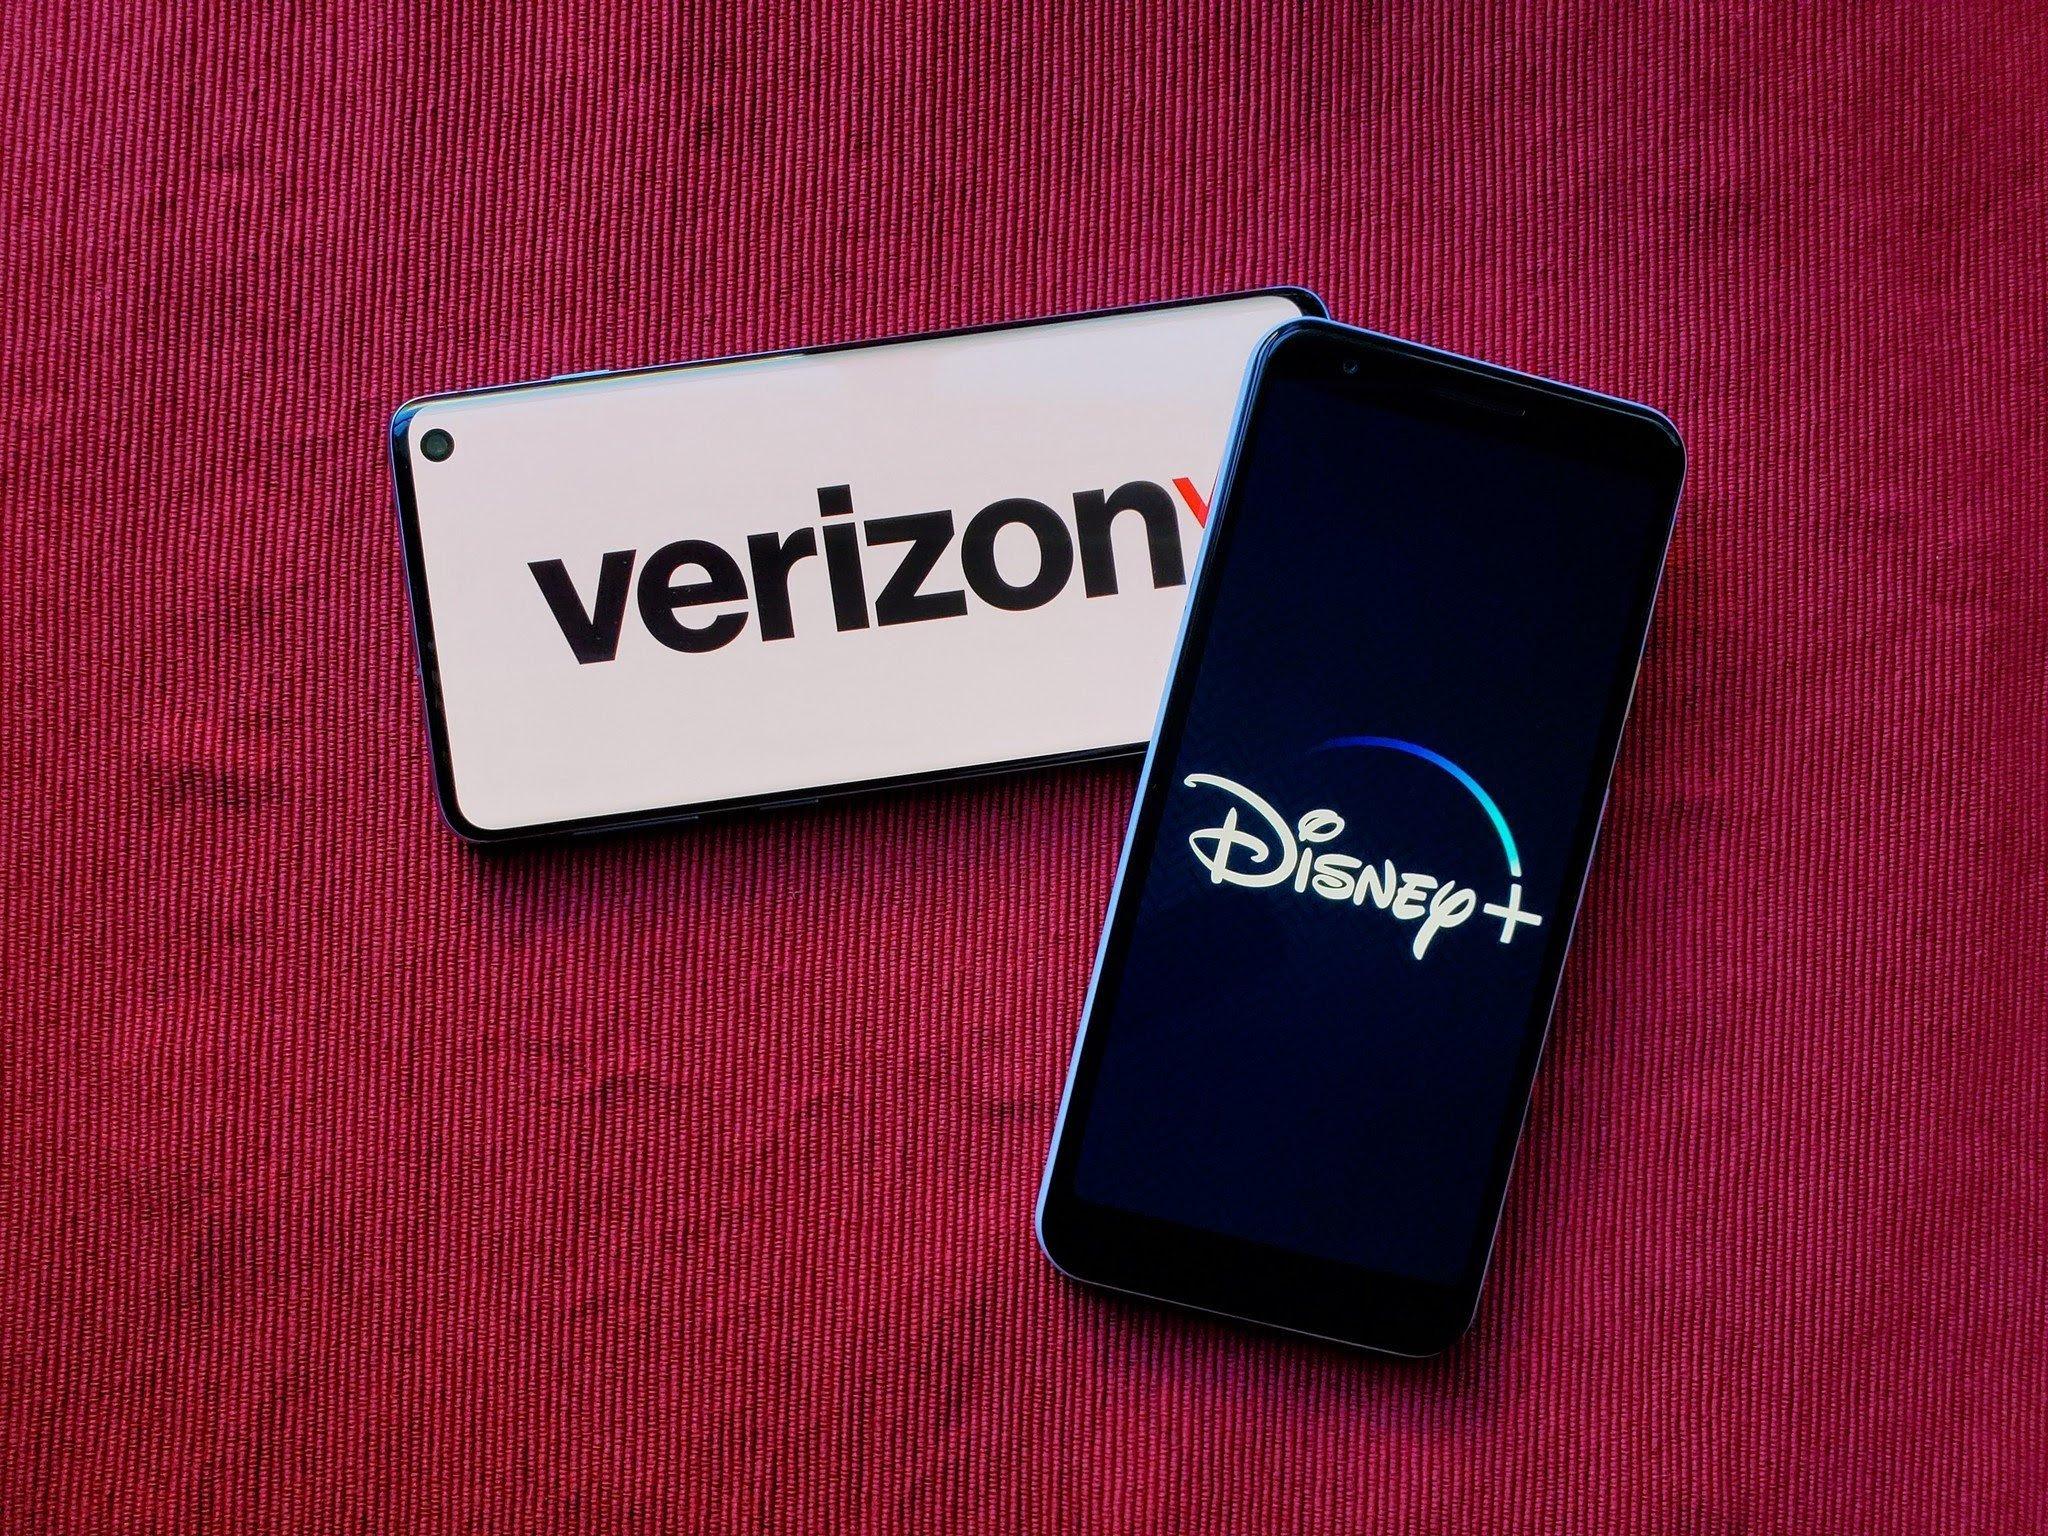 Verizon phone insurance: Everything you need to know